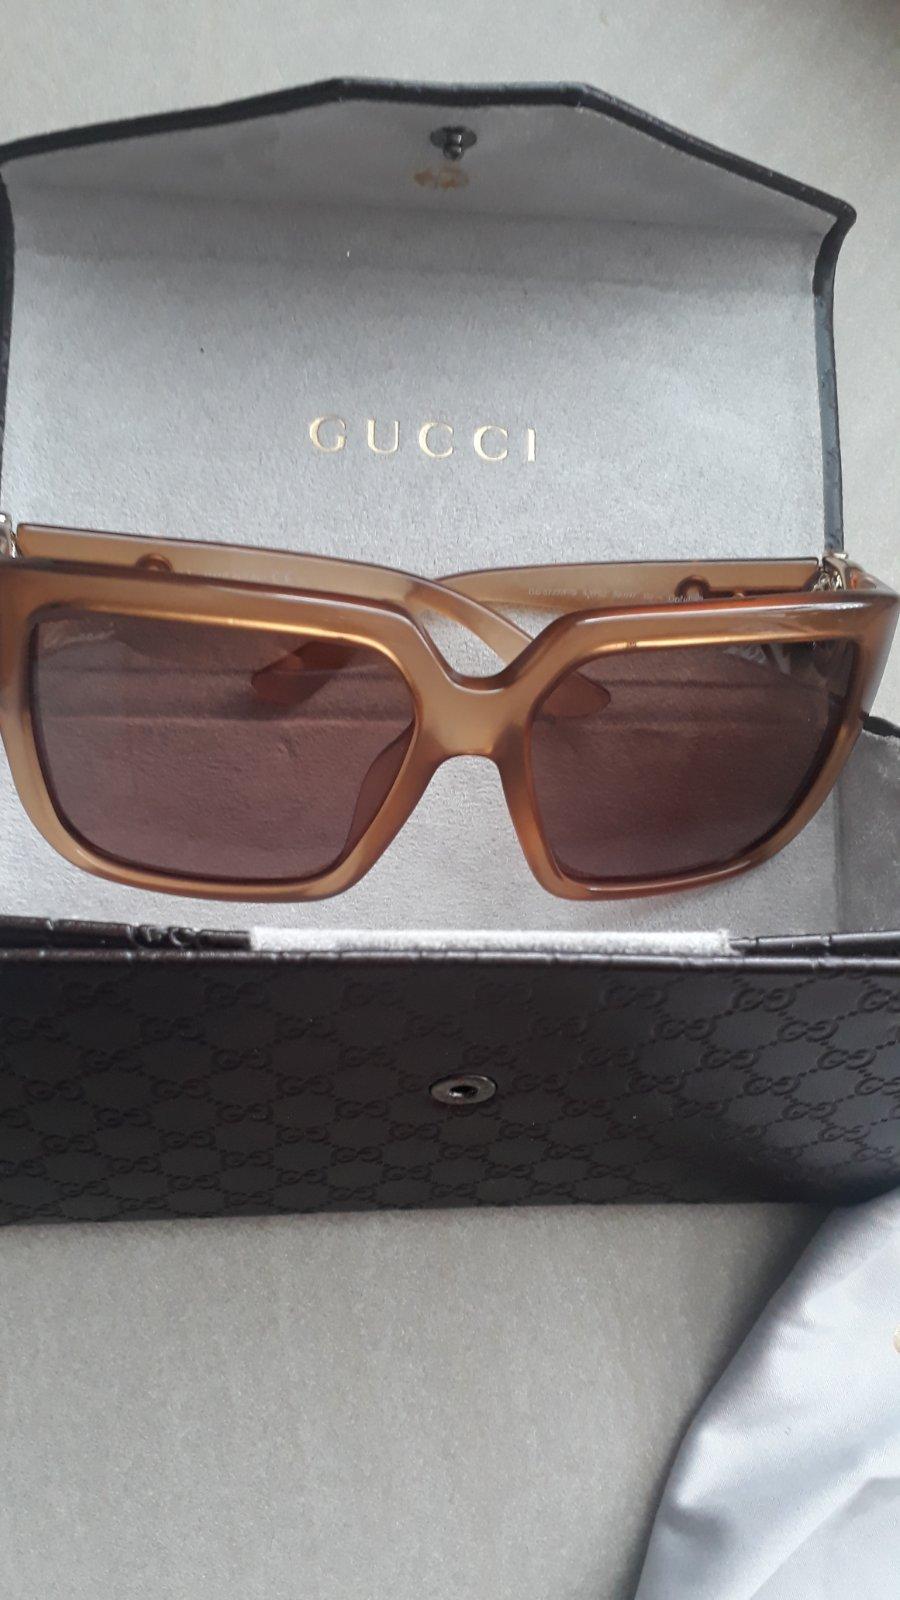 Gucci slnečné okuliare originál top stav b3dad05d45e